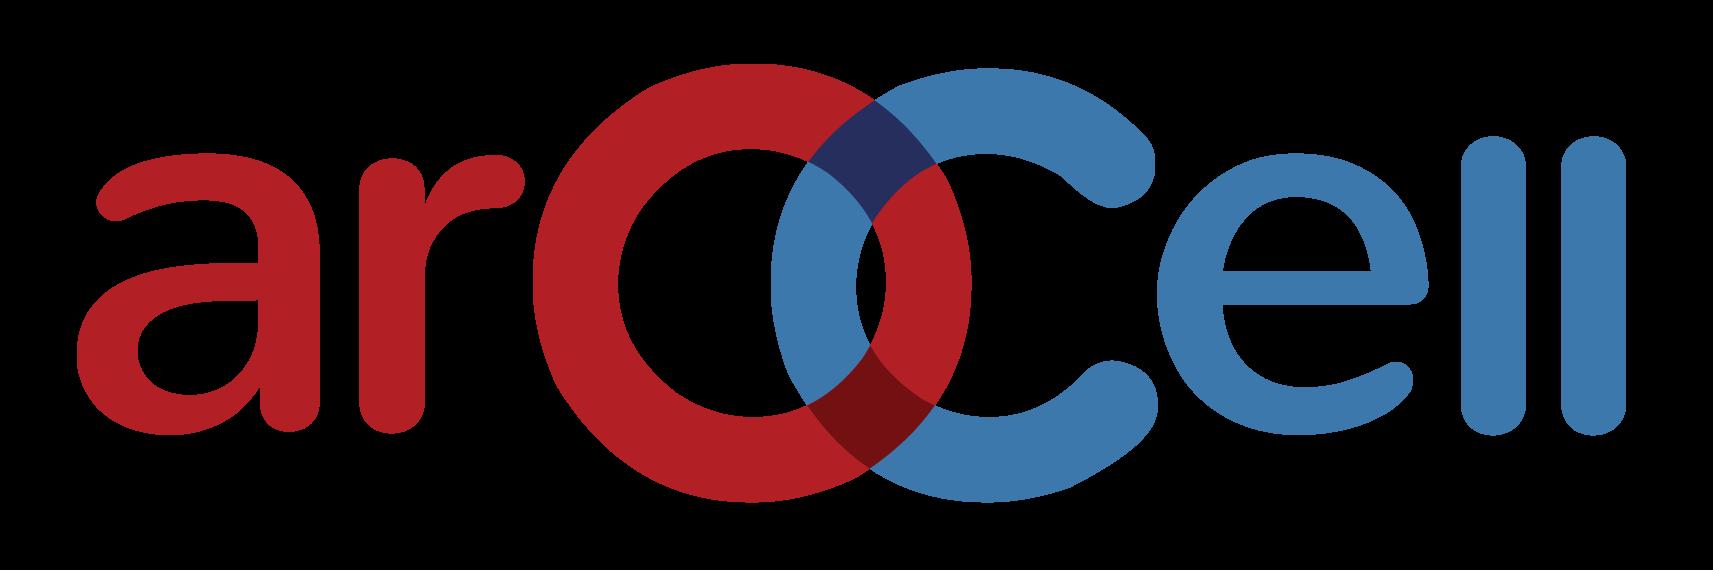 Logo - Arocell AB